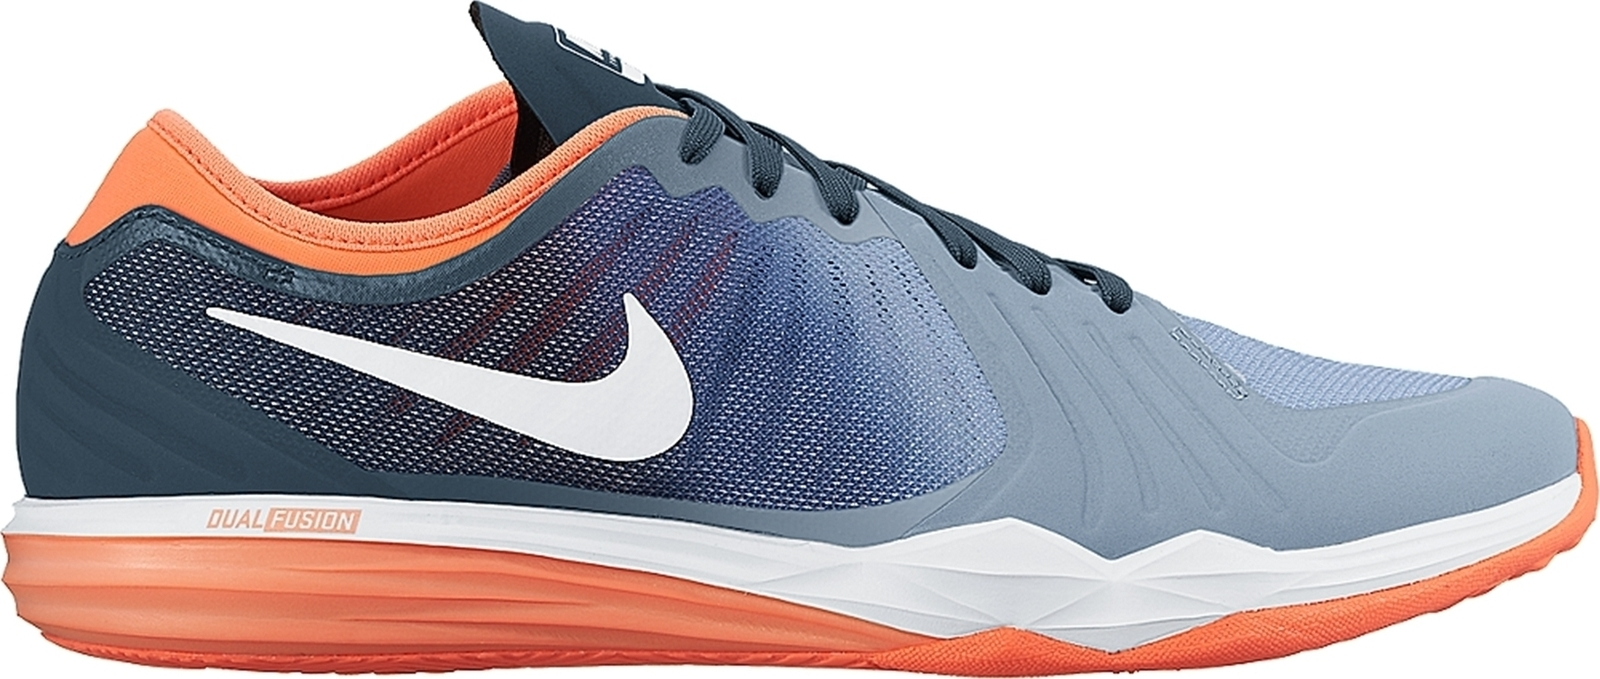 ir a buscar pequeño excepción  Nike Dual Fusion TR 4 Print 819022-401 - Skroutz.gr